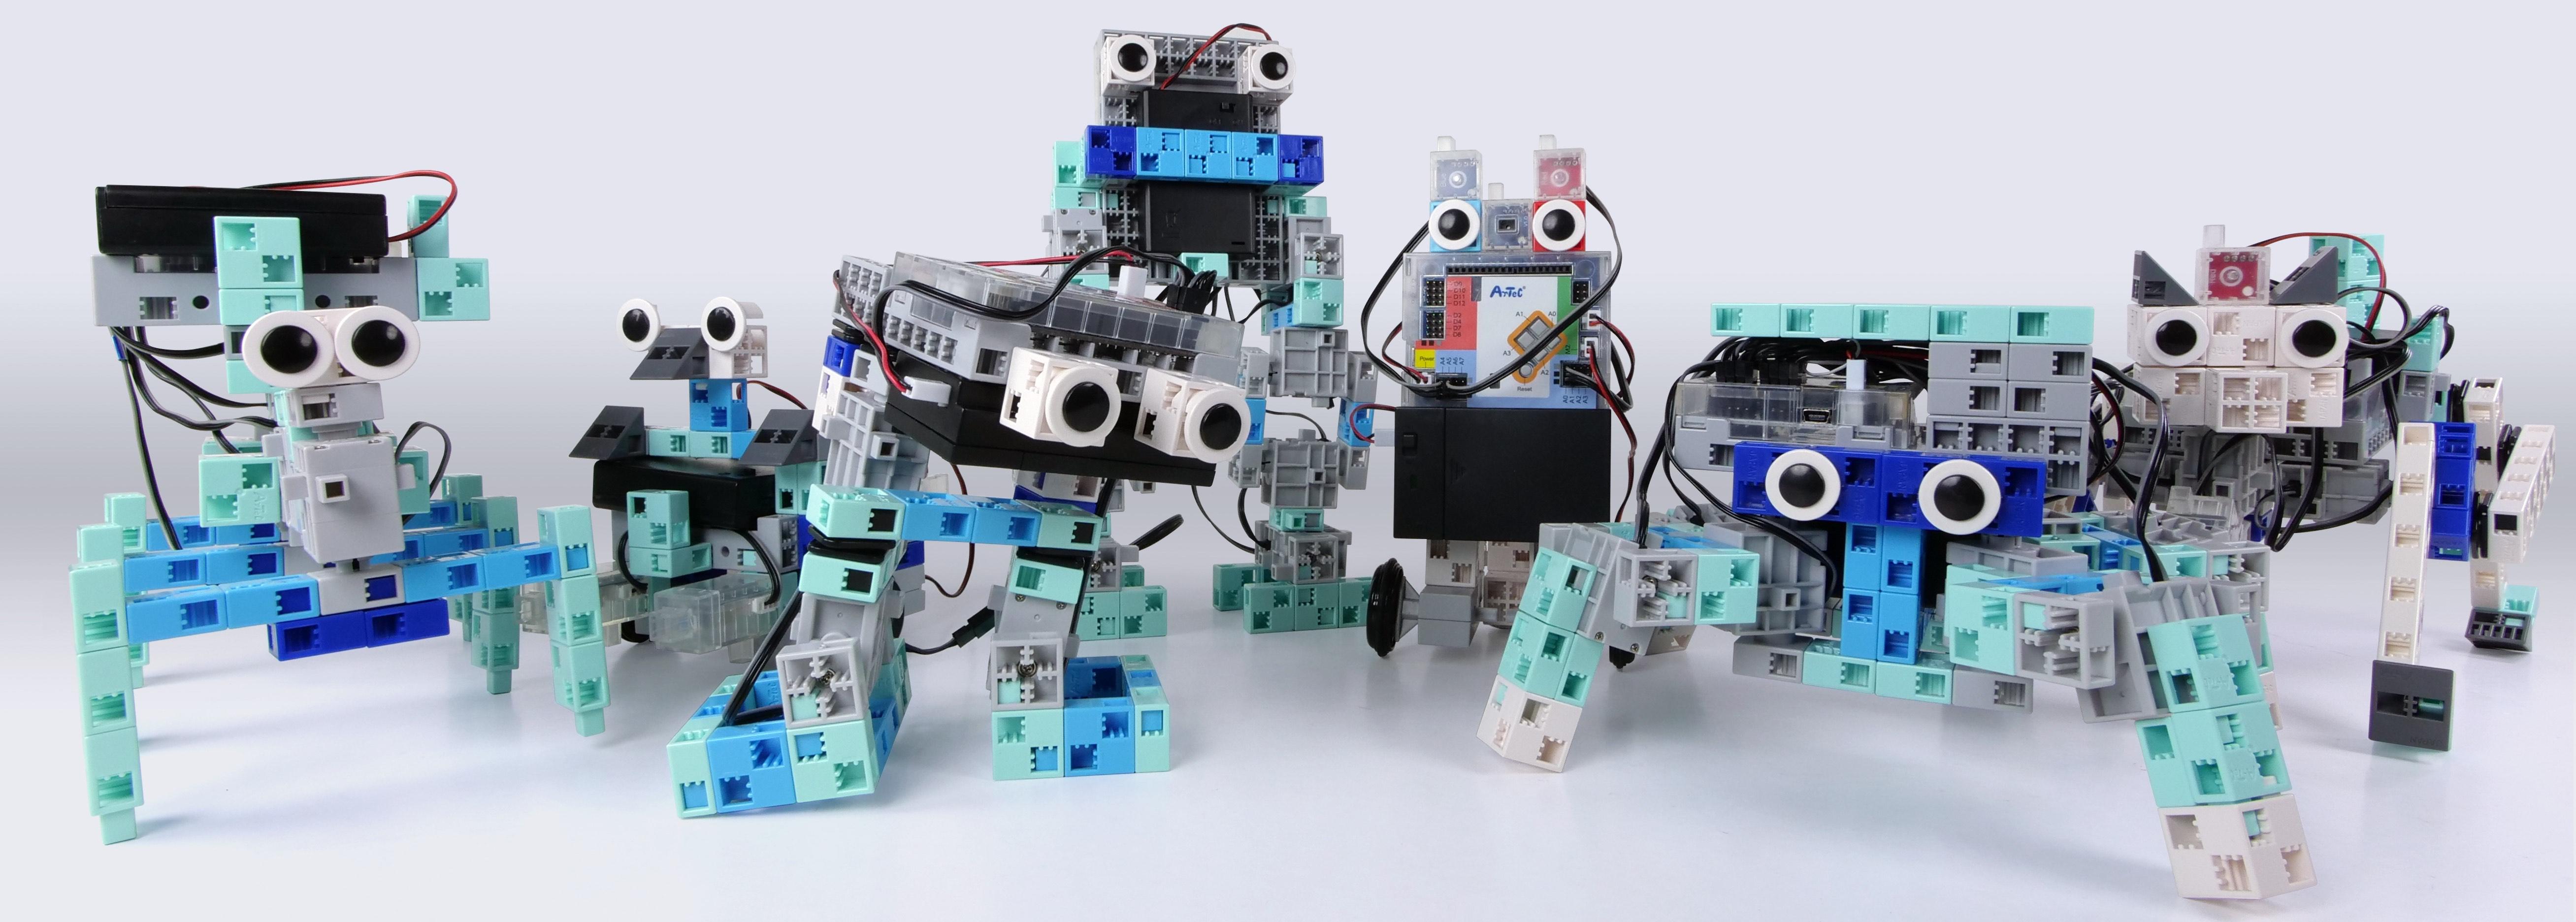 ecole de robotique algora douai - exemples de robots